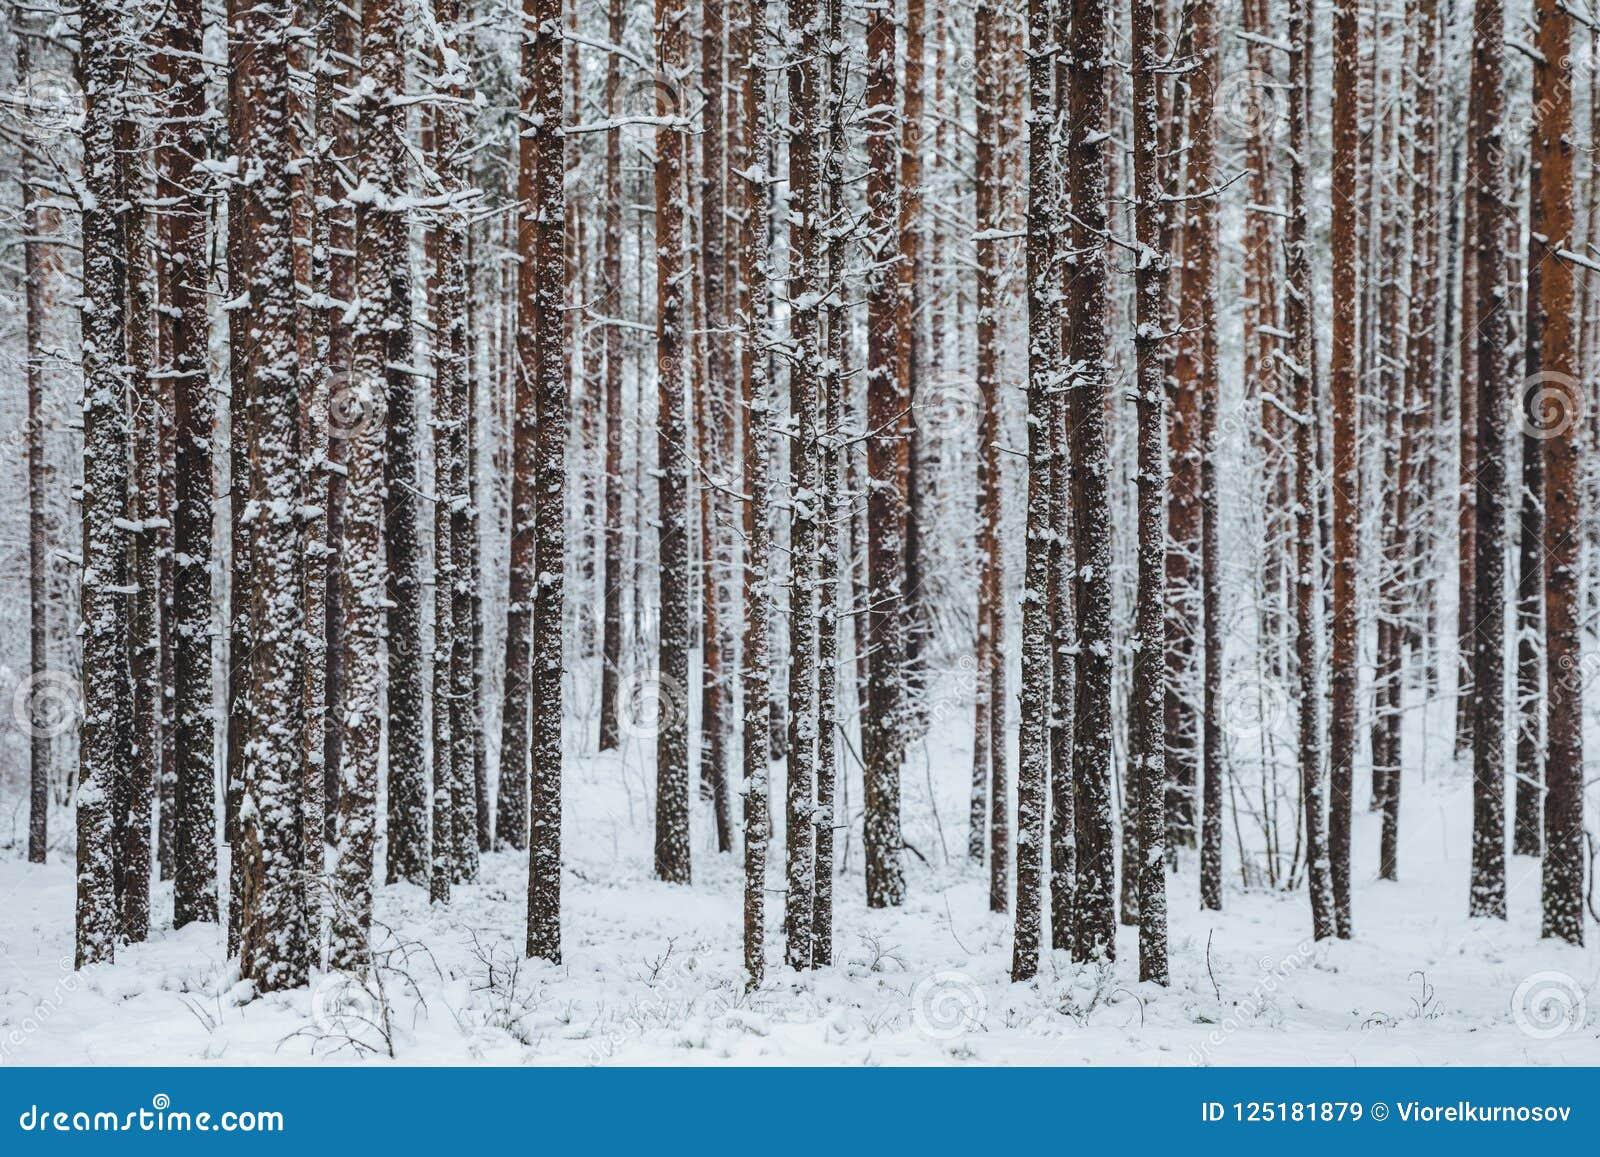 stunning winter scene canvas print tree home natural seasonal nature snow blue